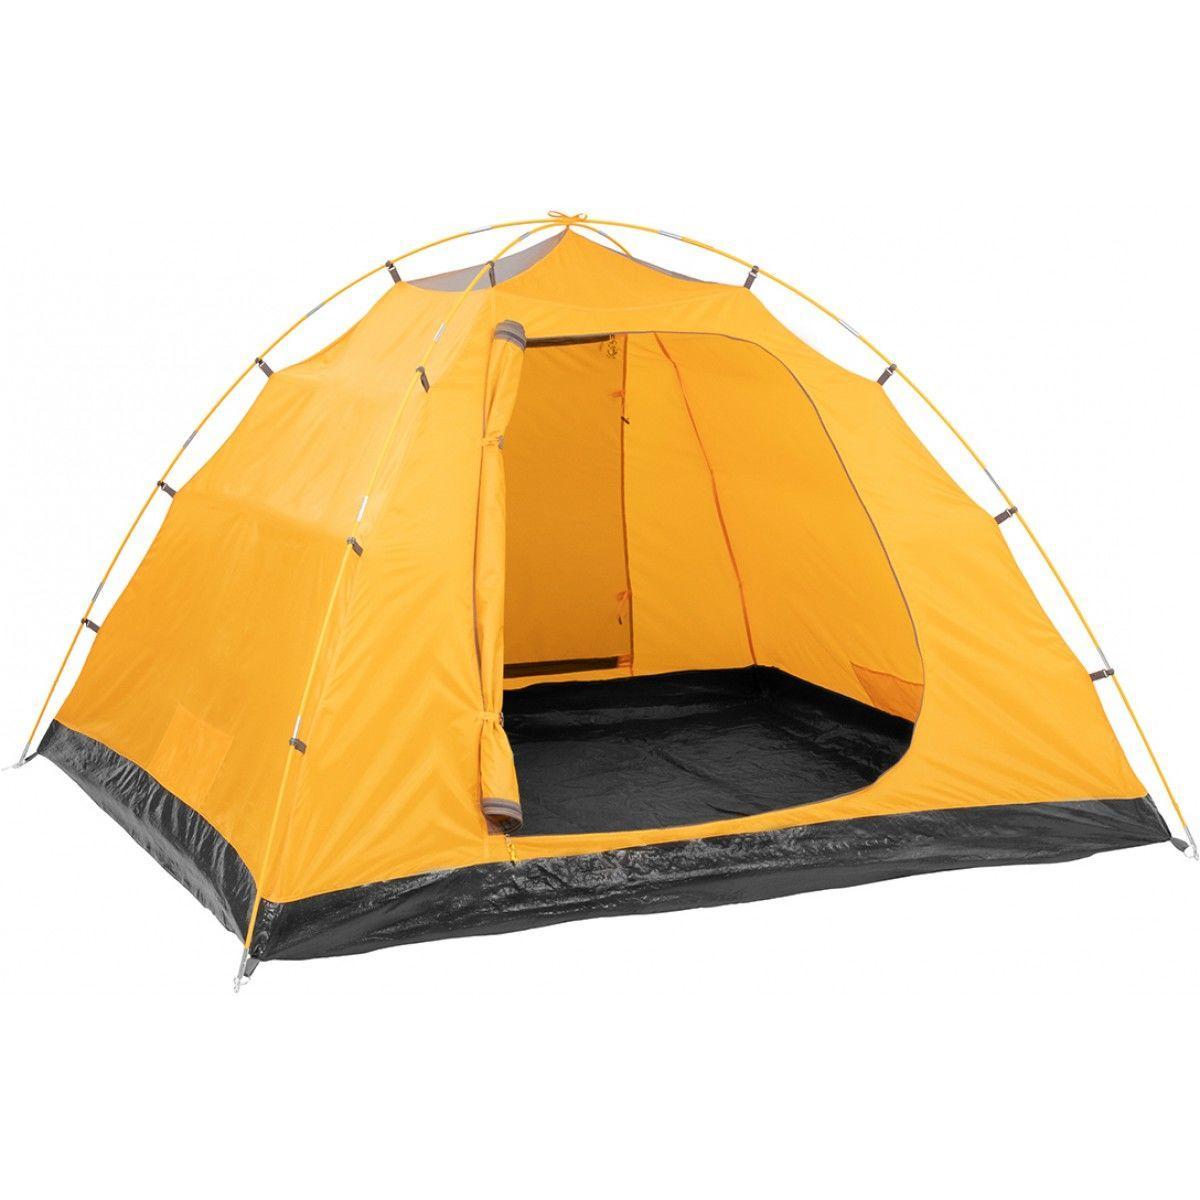 Палатка MUSSON-4 Helios зеленый-оранжевый HS-2366-4 GO - фото 6